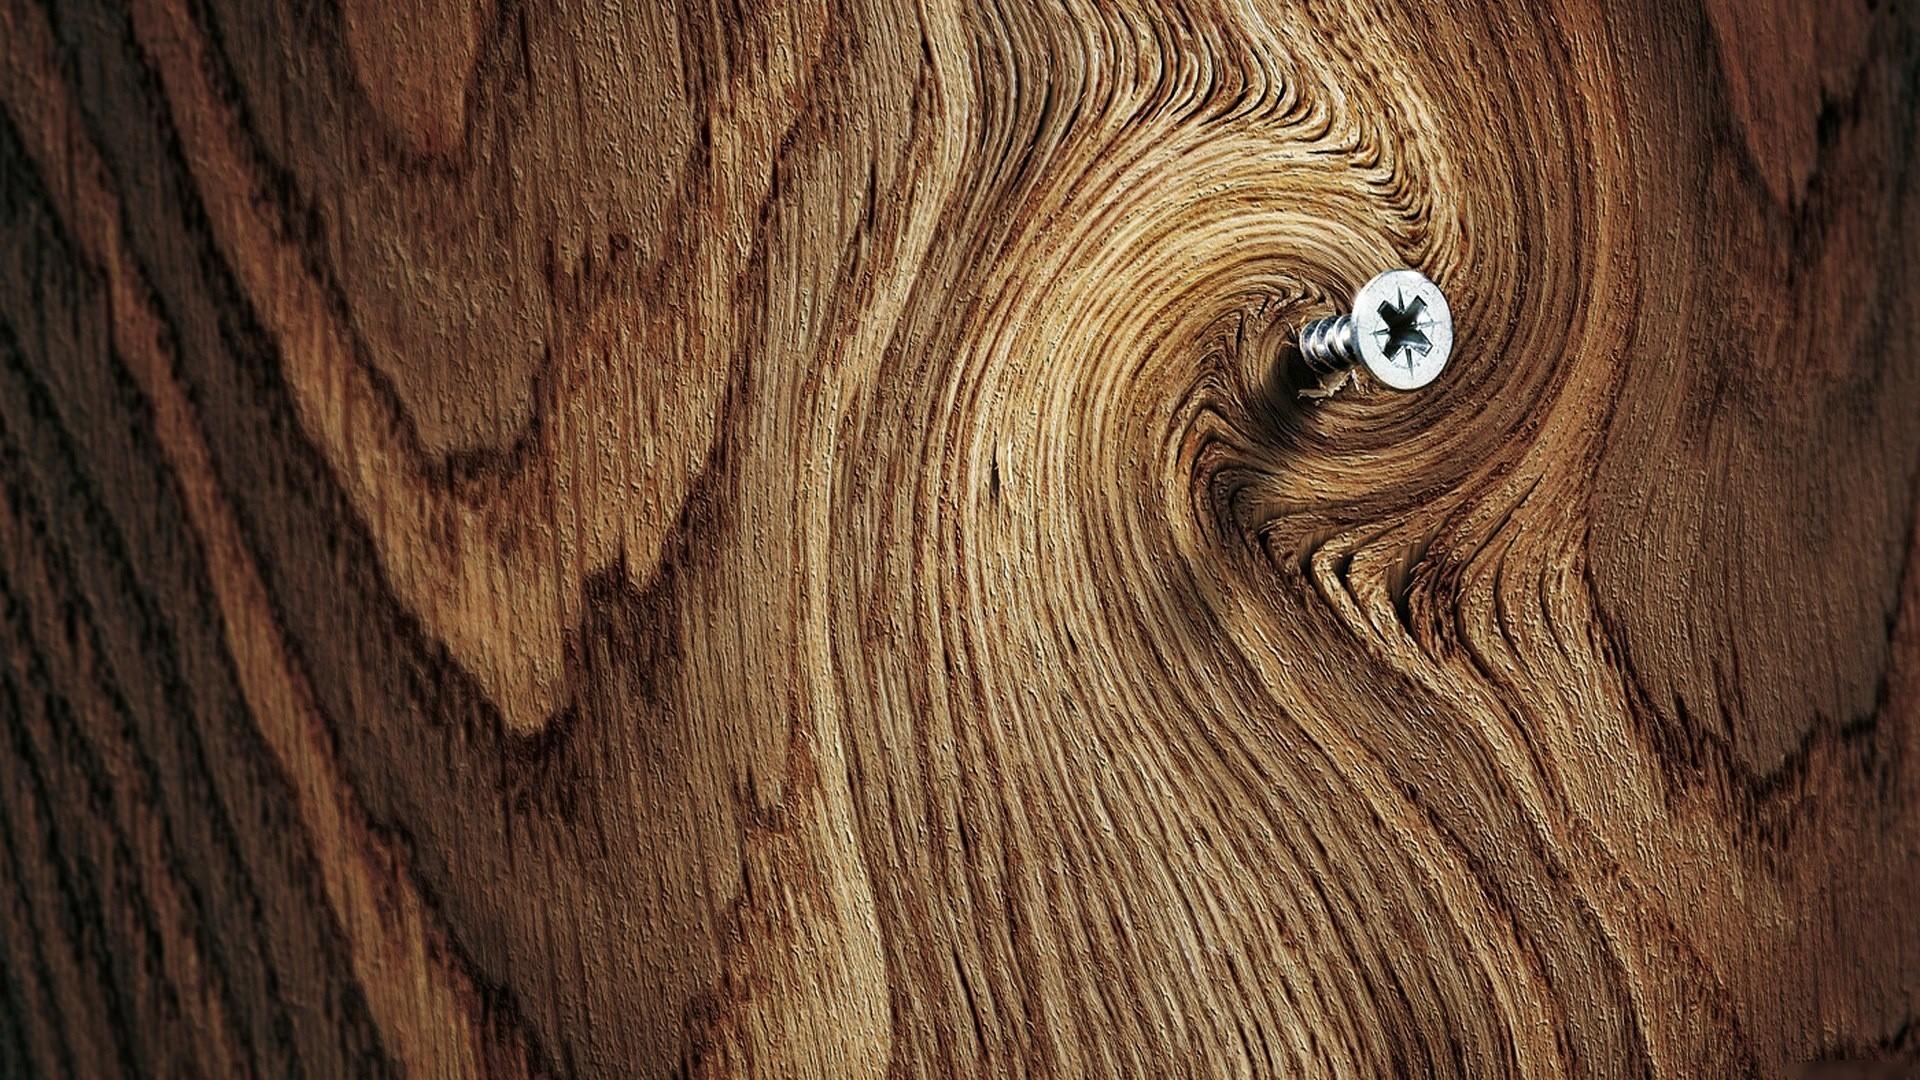 Res: 1920x1080, Screw In Wood Wallpaper HD